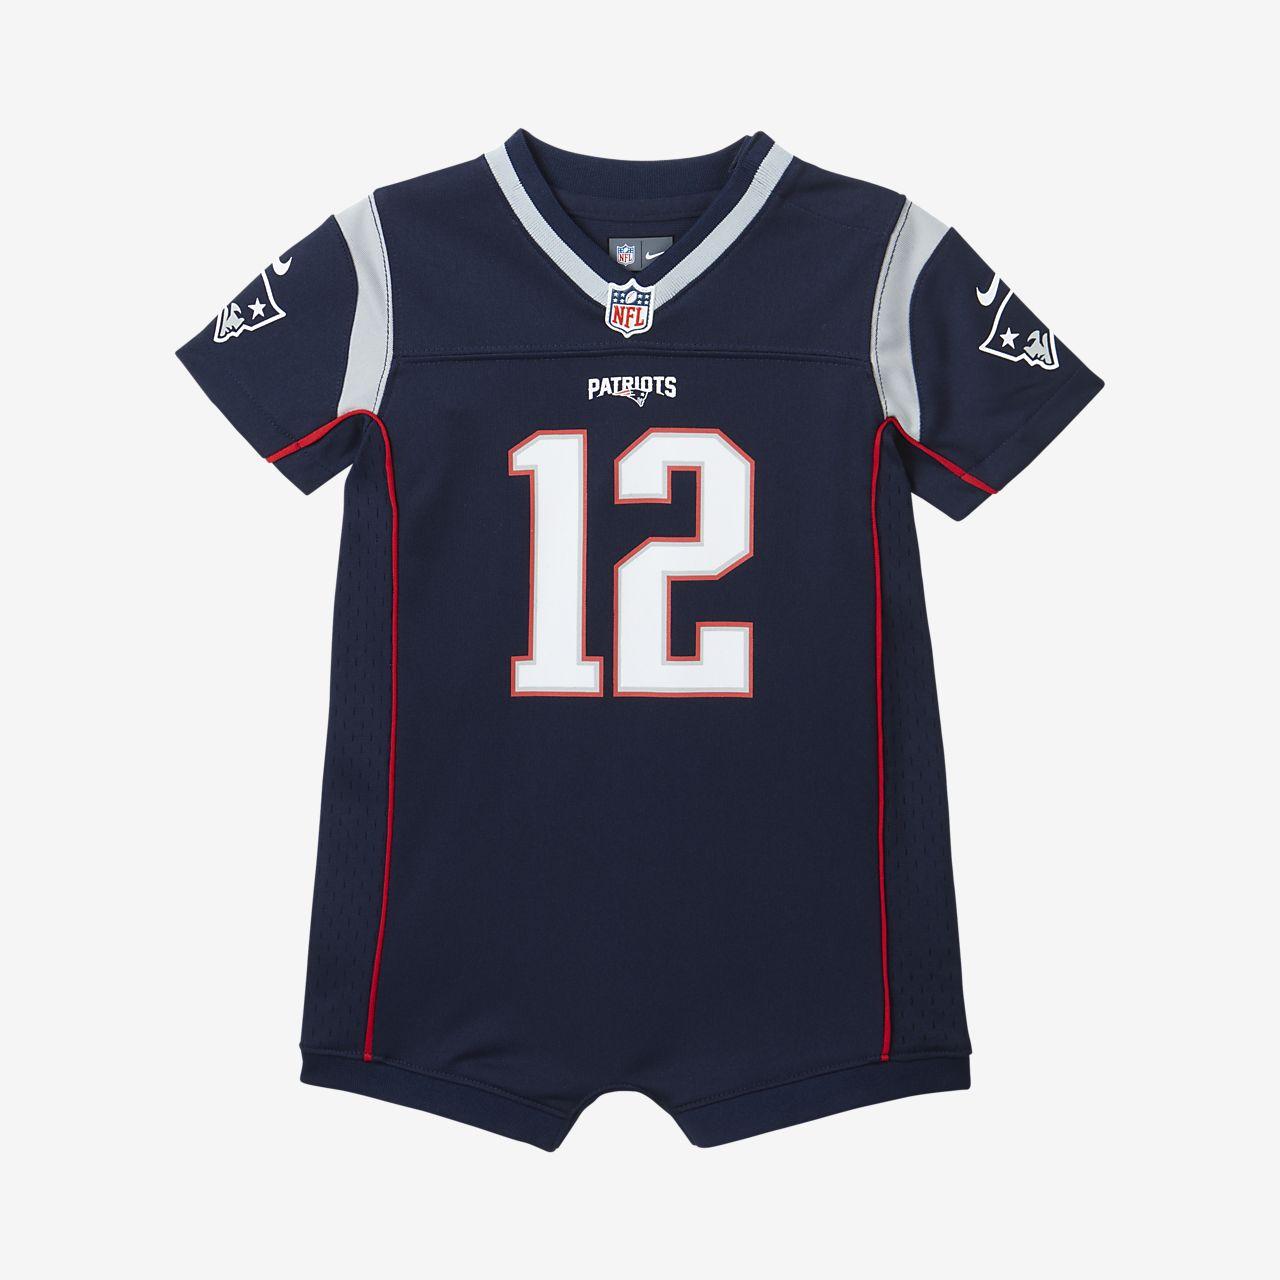 new england patriots infant jersey